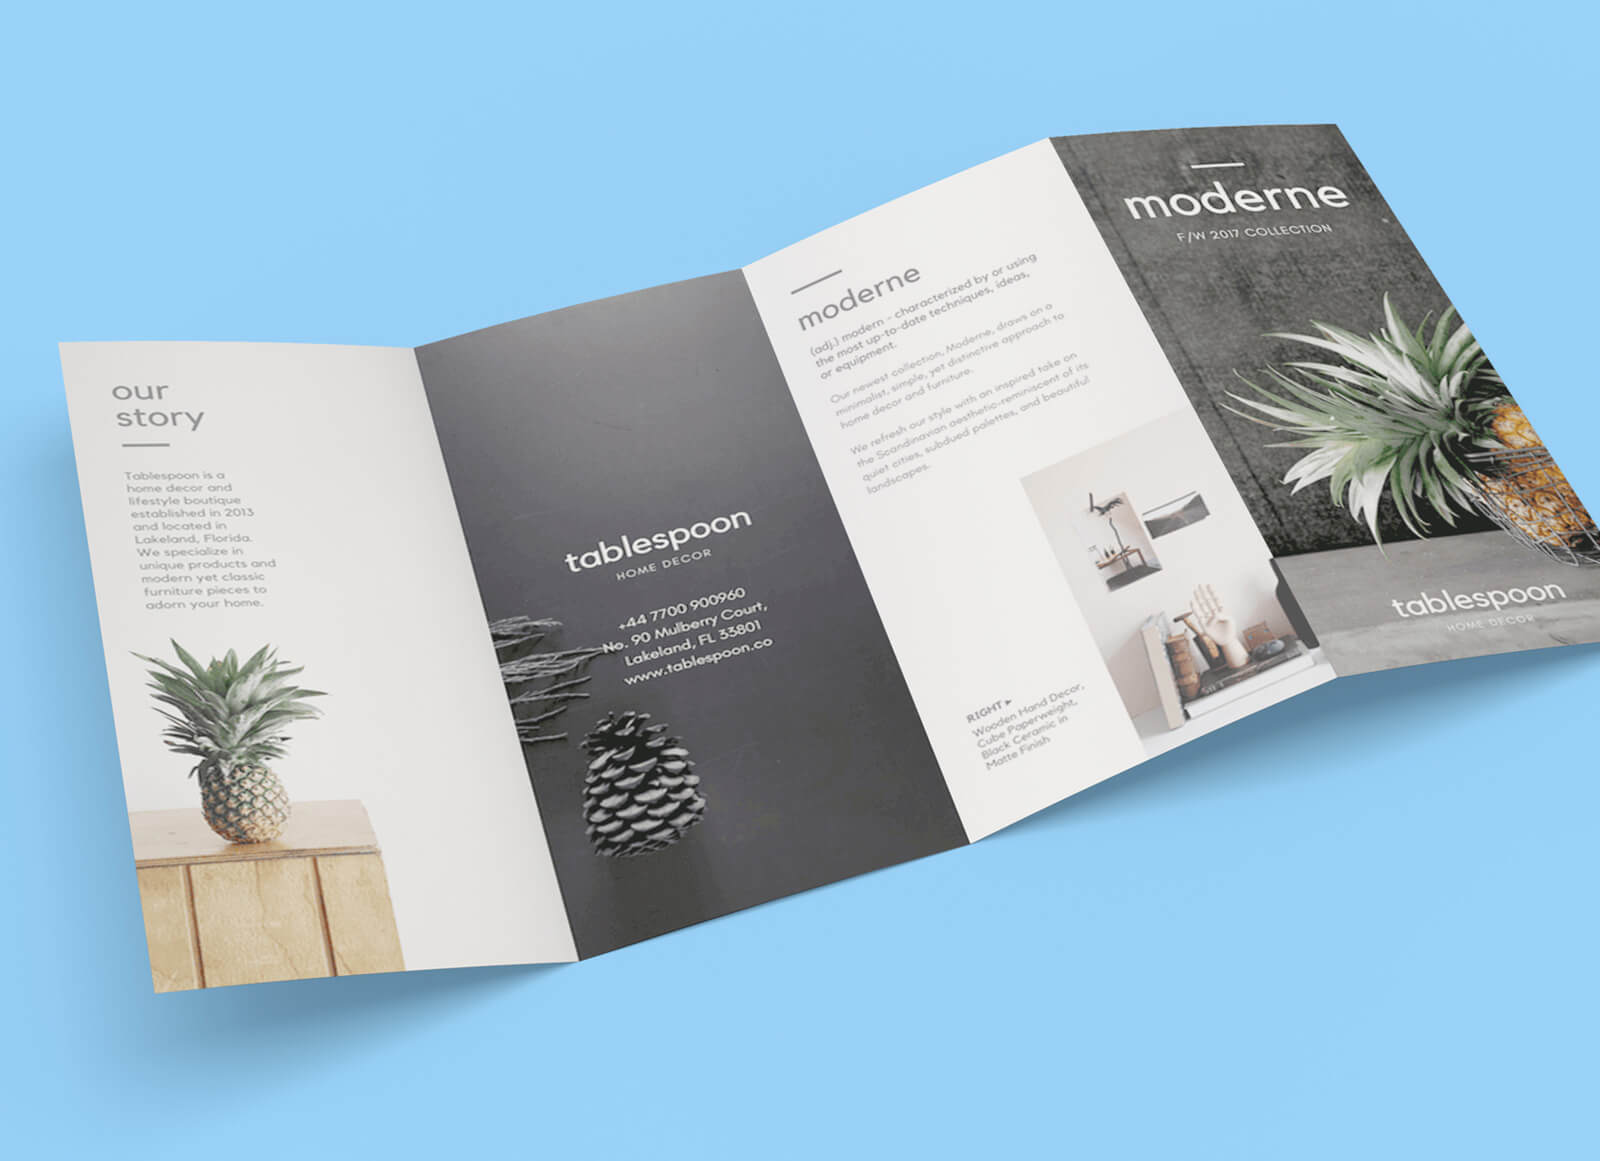 Free 4 Panel Quad Fold Brochure Mockup Psd - Good Mockups Regarding Quad Fold Brochure Template